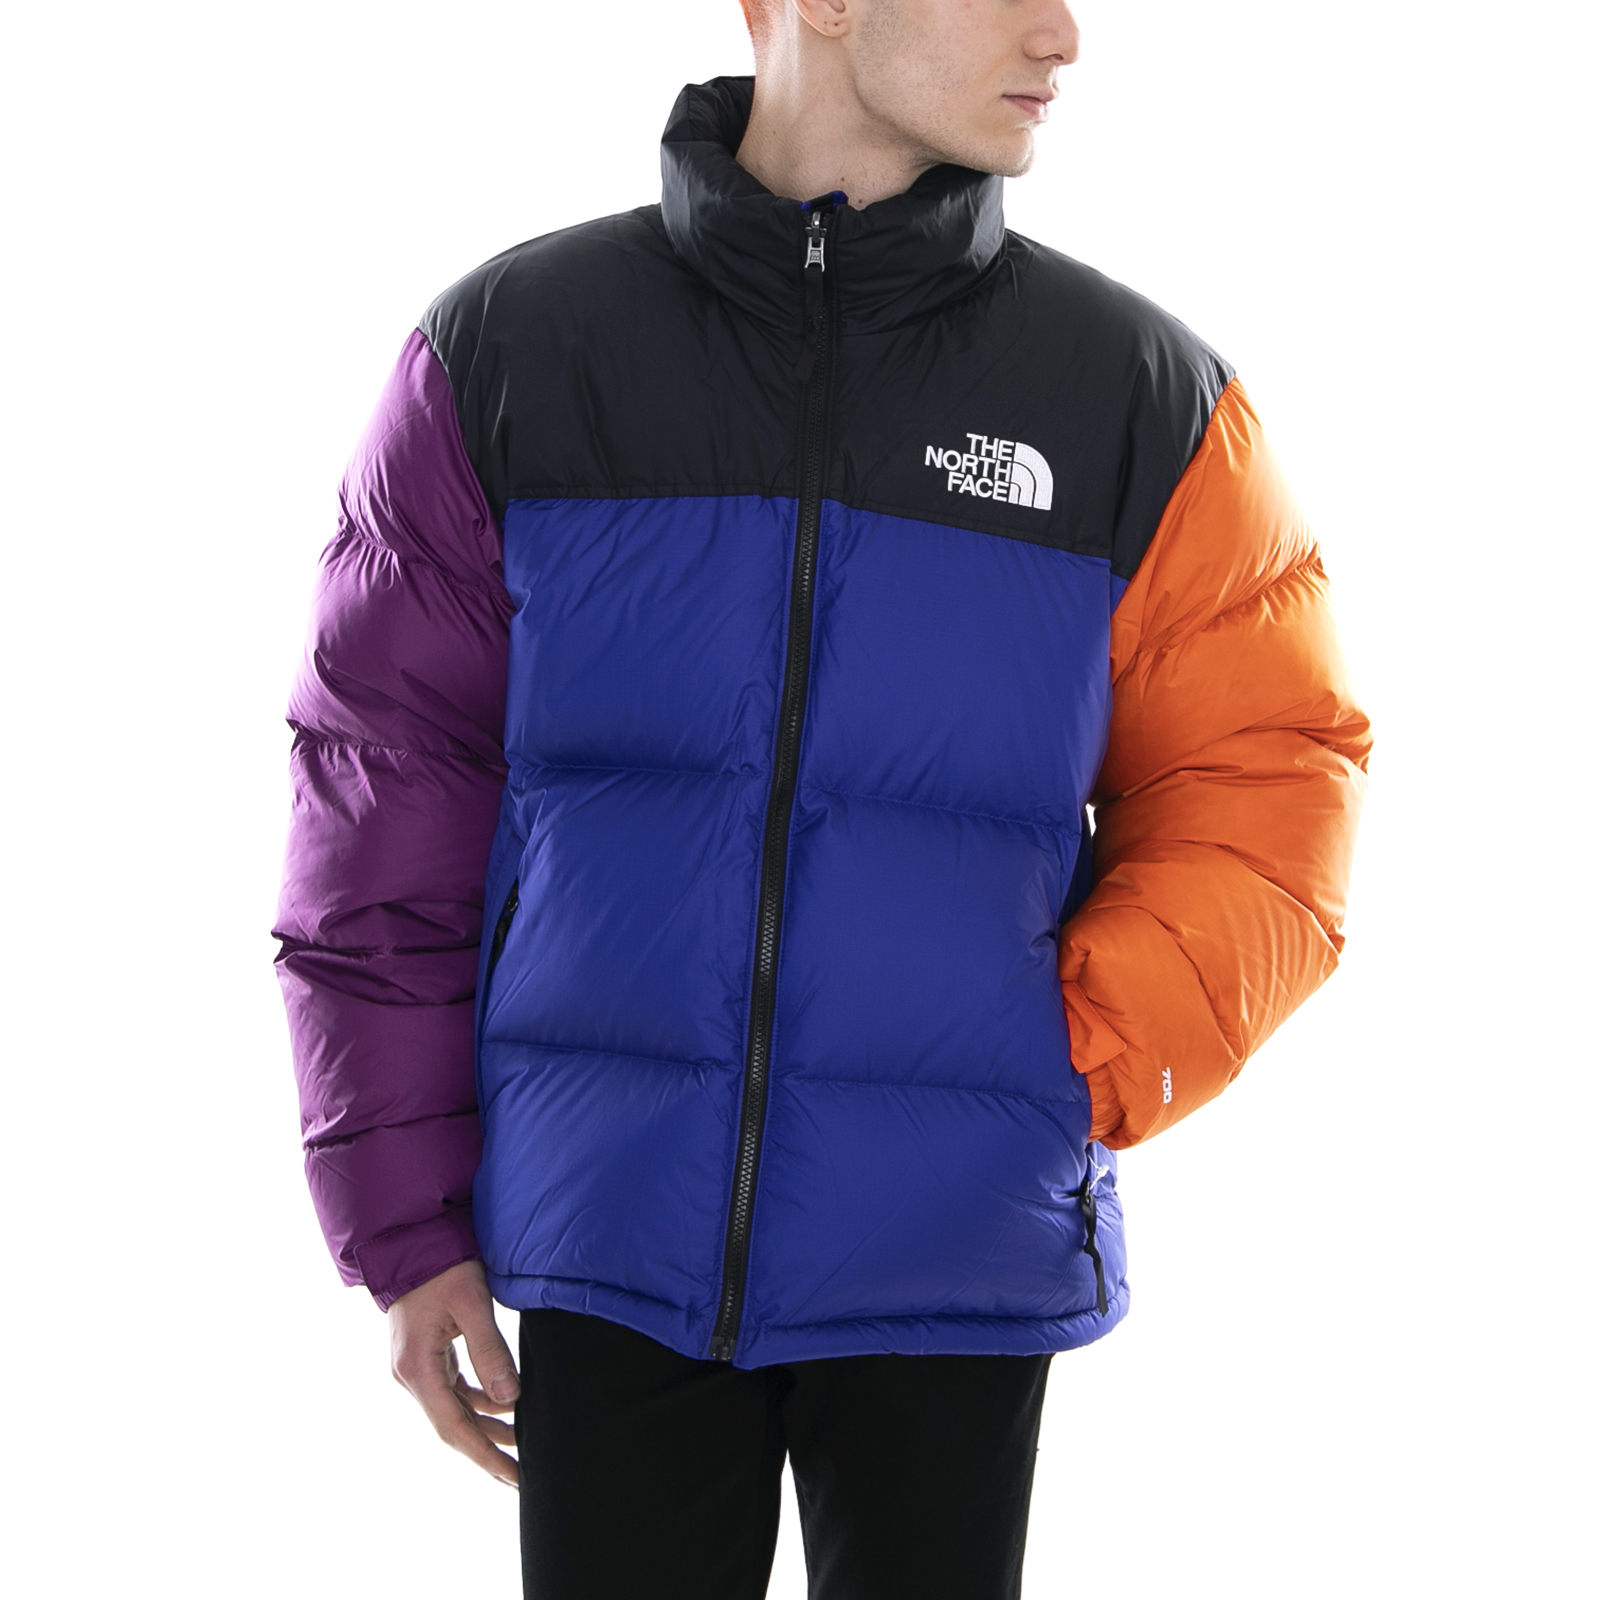 524137100d The north face giacche  92 rage collection - m 1996 retro nuptse jacket  aztec blue